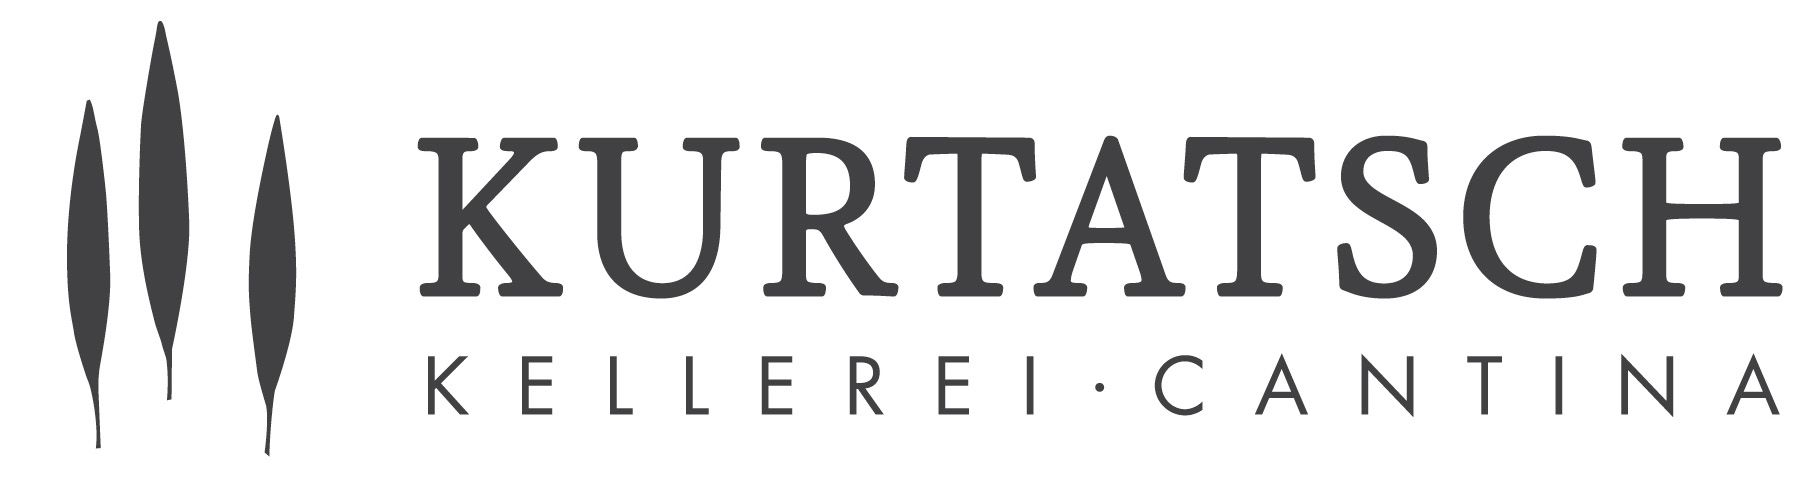 Kellerei_Kurtatsch_Logo.jpg